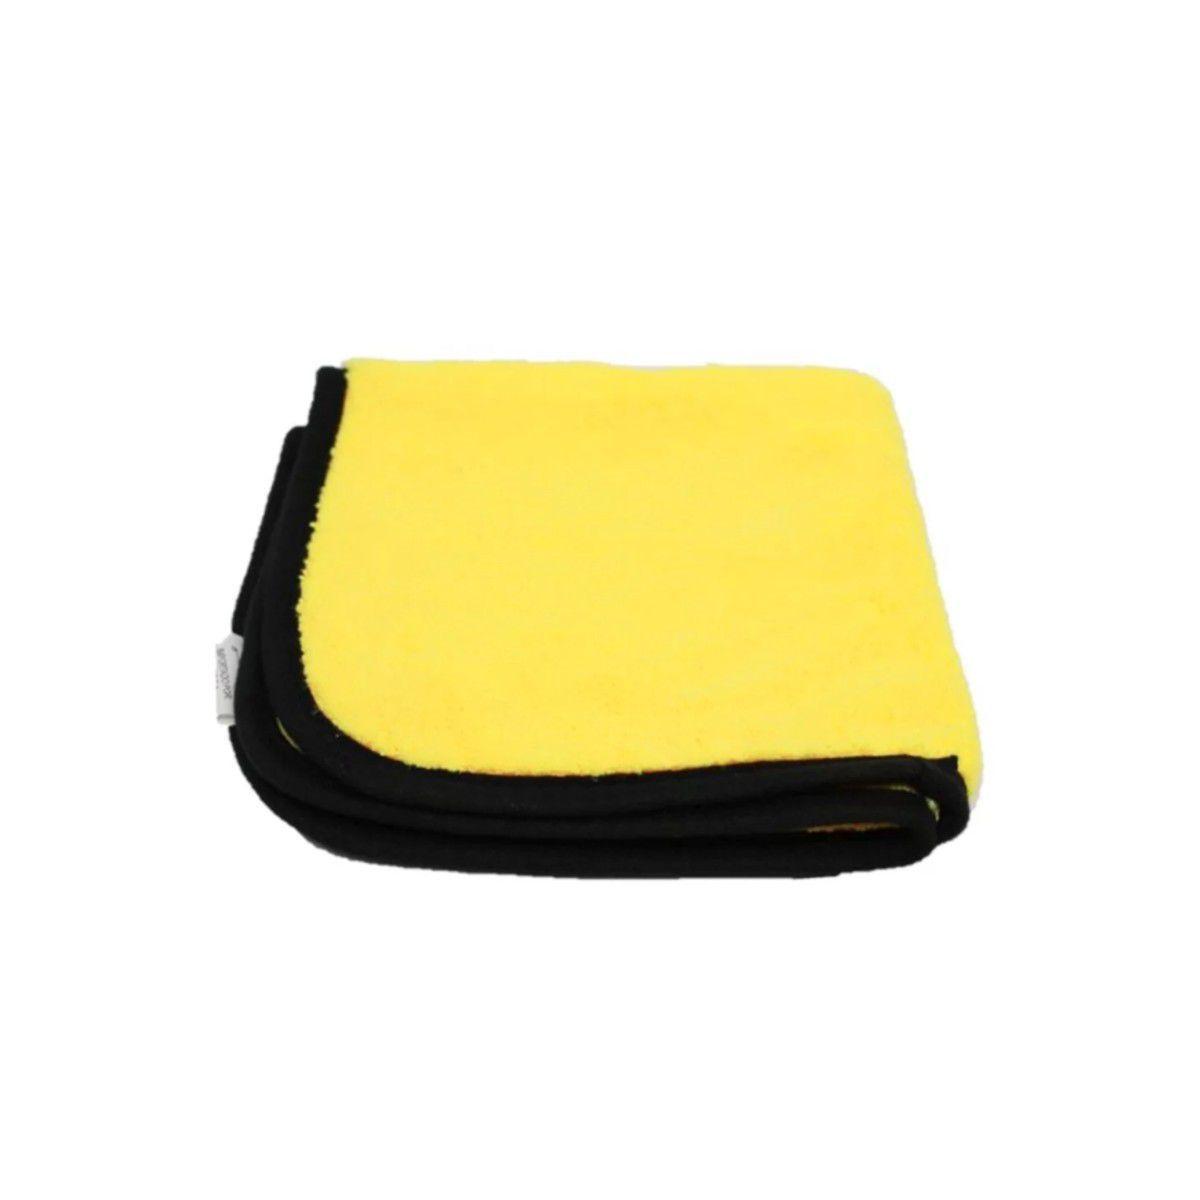 Kit Polimento Automotivo Lumina Wax +Pano de Microfibra Amarela